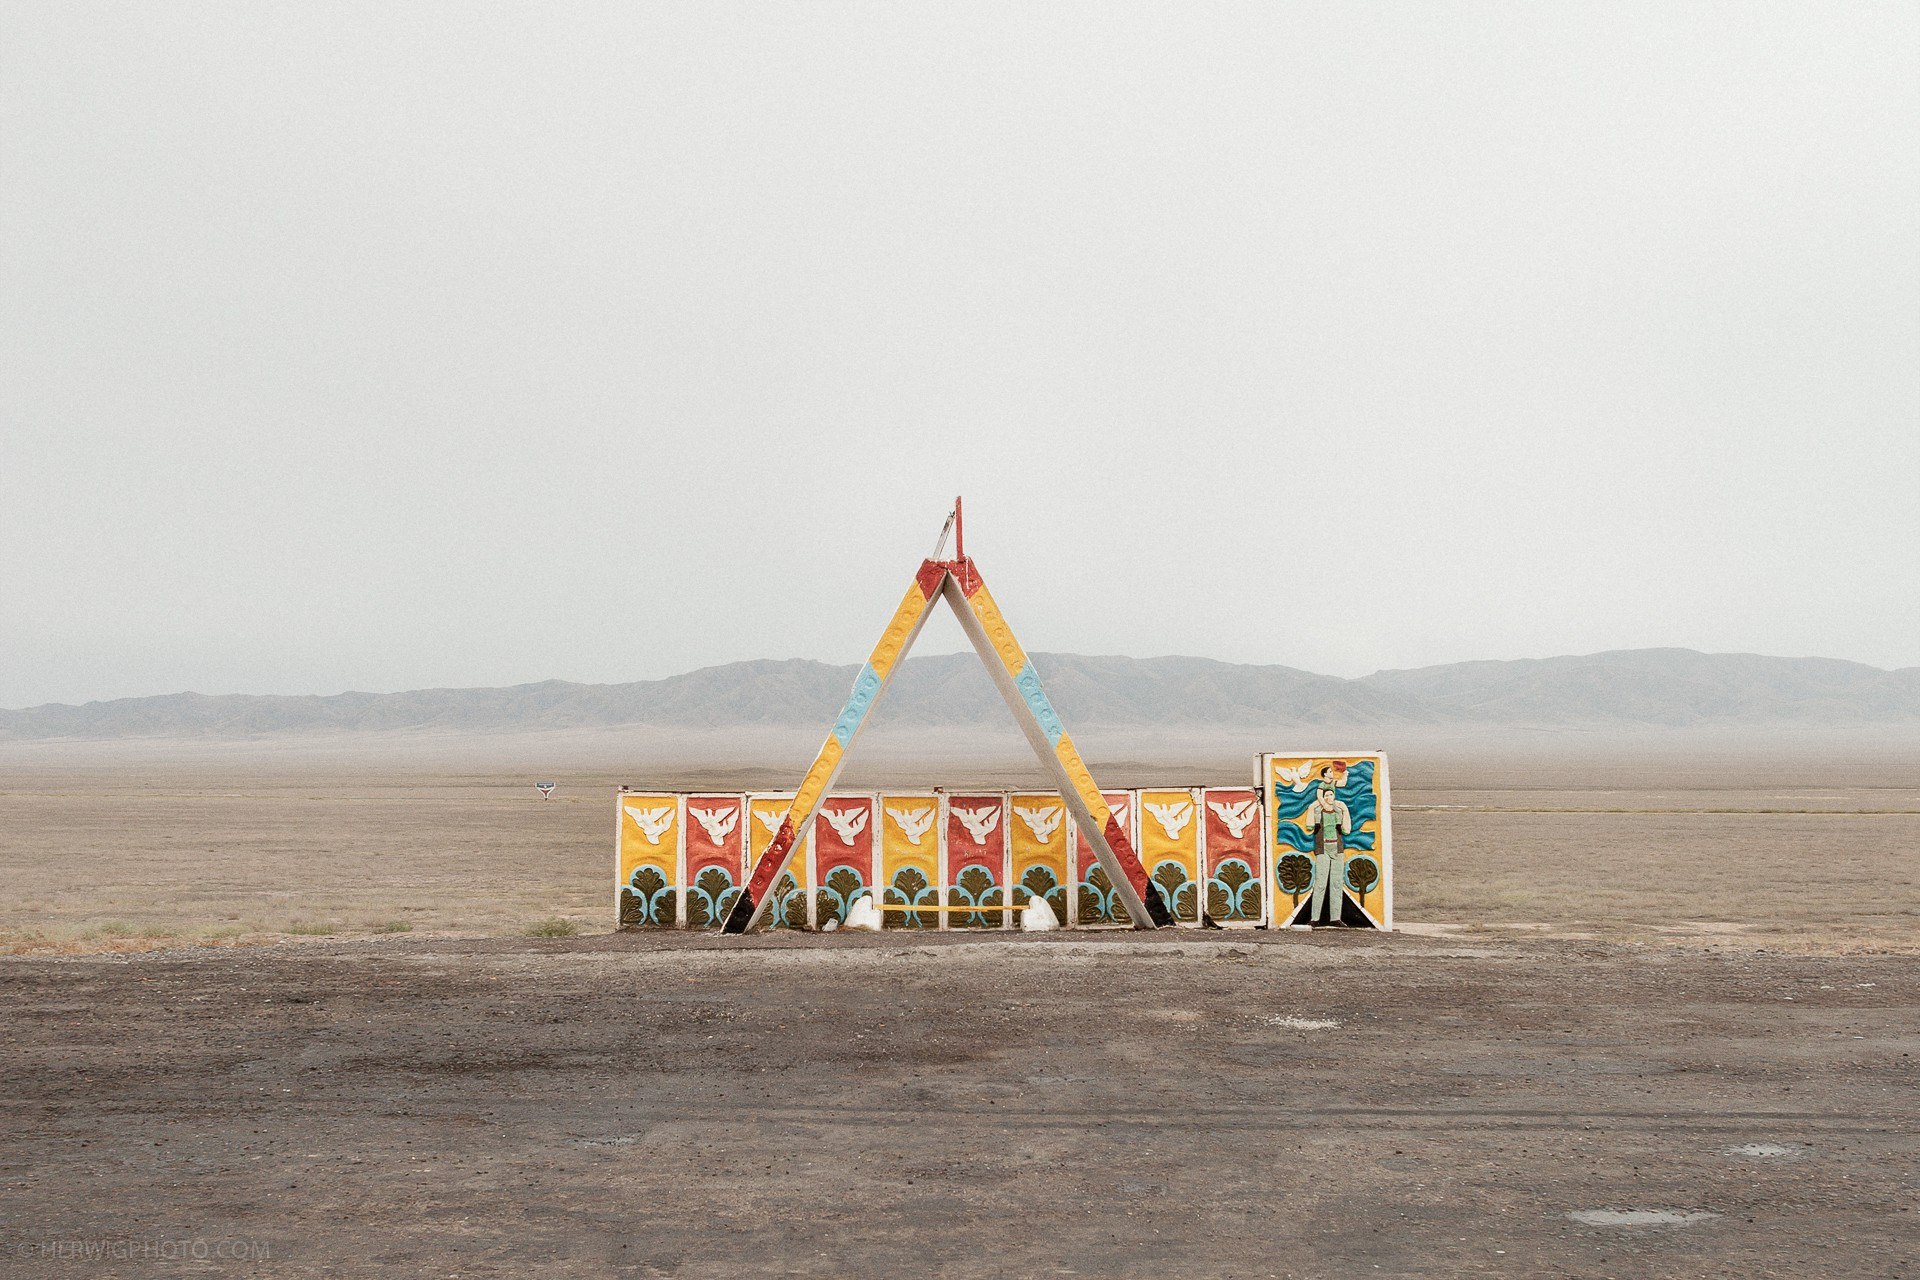 Soviet bus stop photo in Kazakhstan